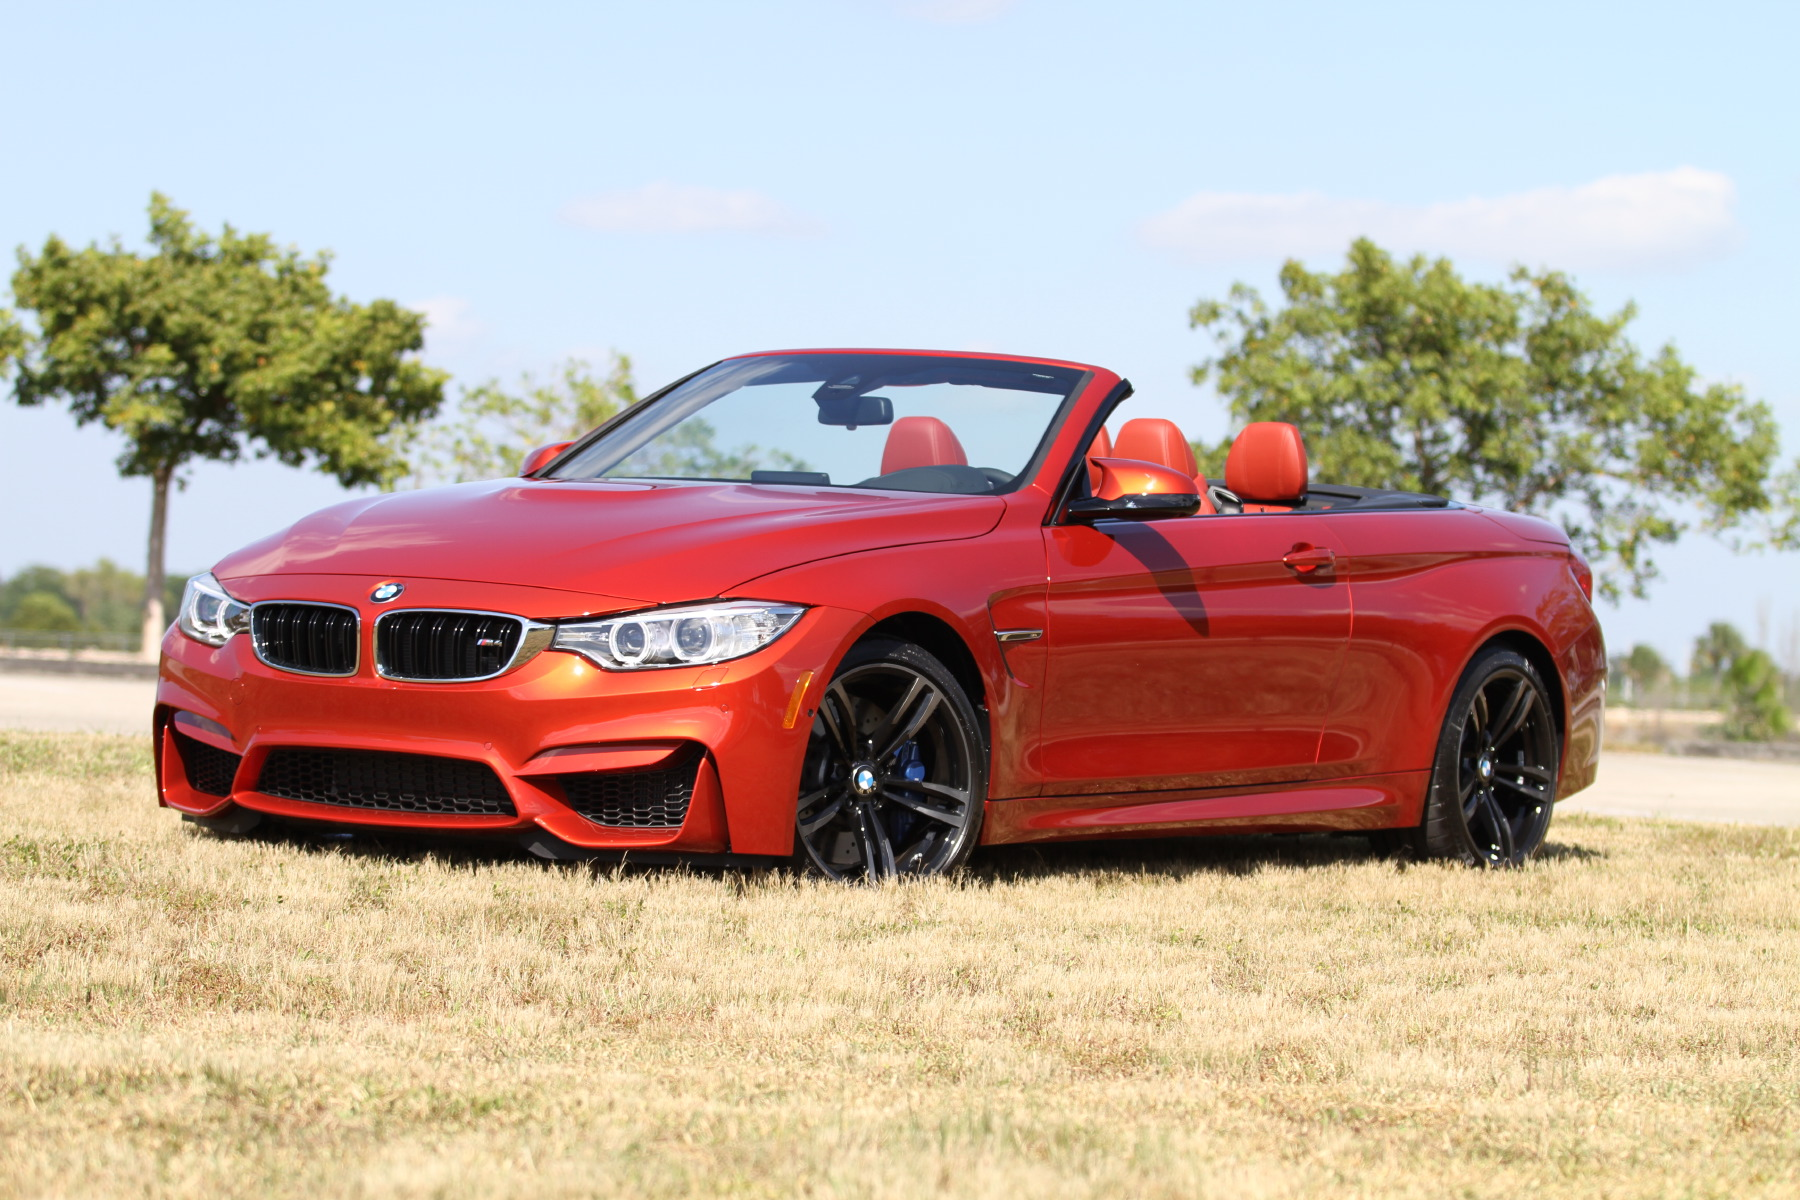 Bmw 328I 0-60 >> 2015 BMW M4 Convertible 1/4 Mile, 0-60 MPH Testing | DragTimes.com Drag Racing, Fast Cars ...